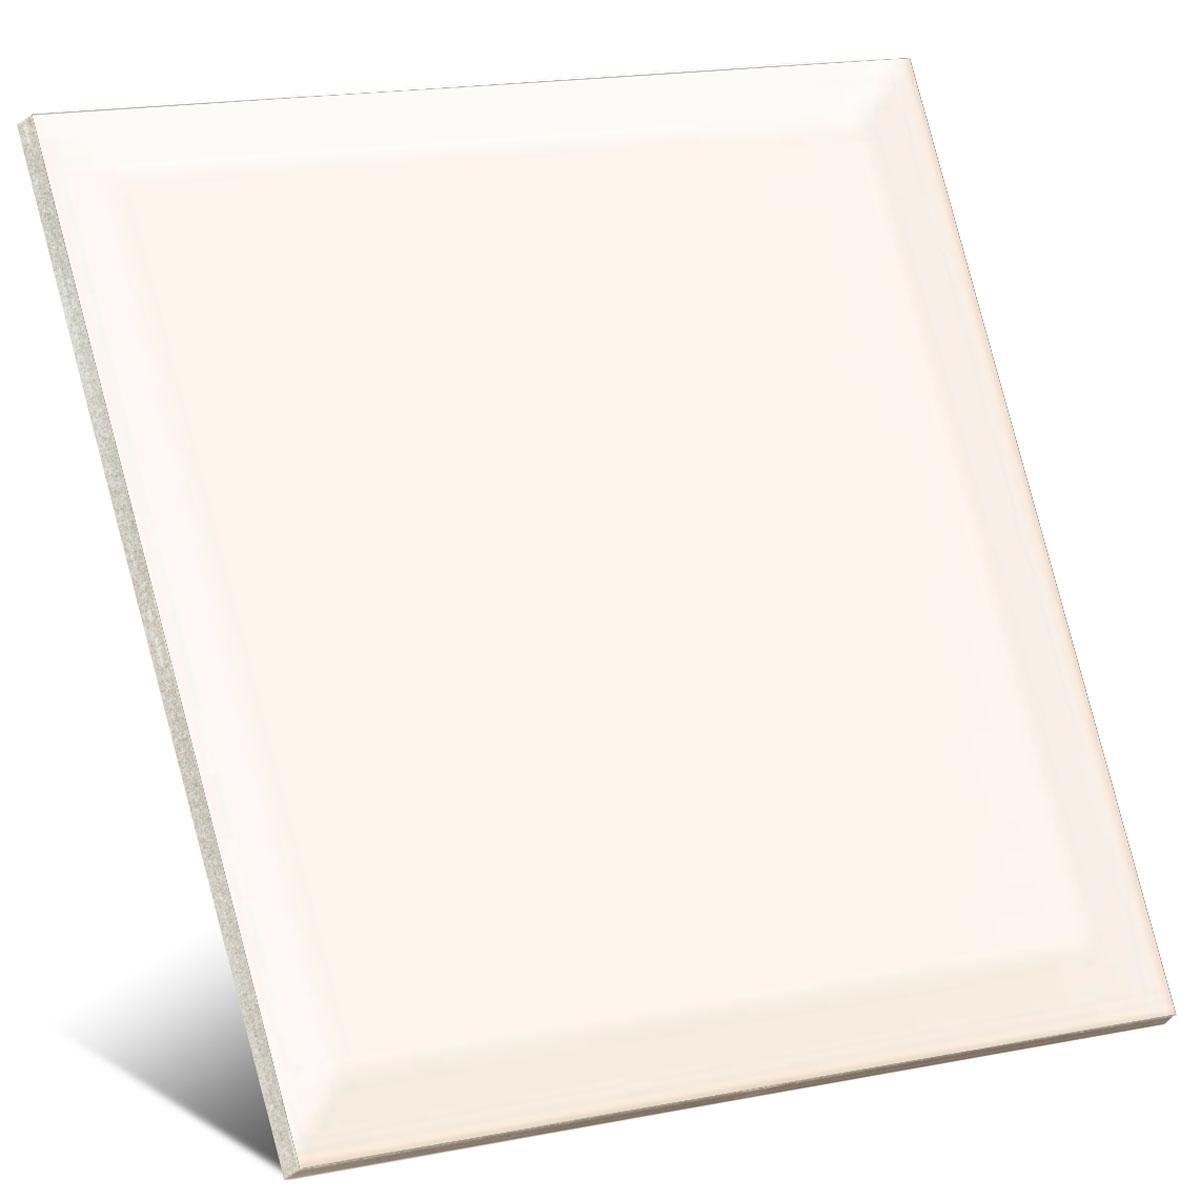 Blanco biselado brillo 20x20 cm (caja 1 m2)